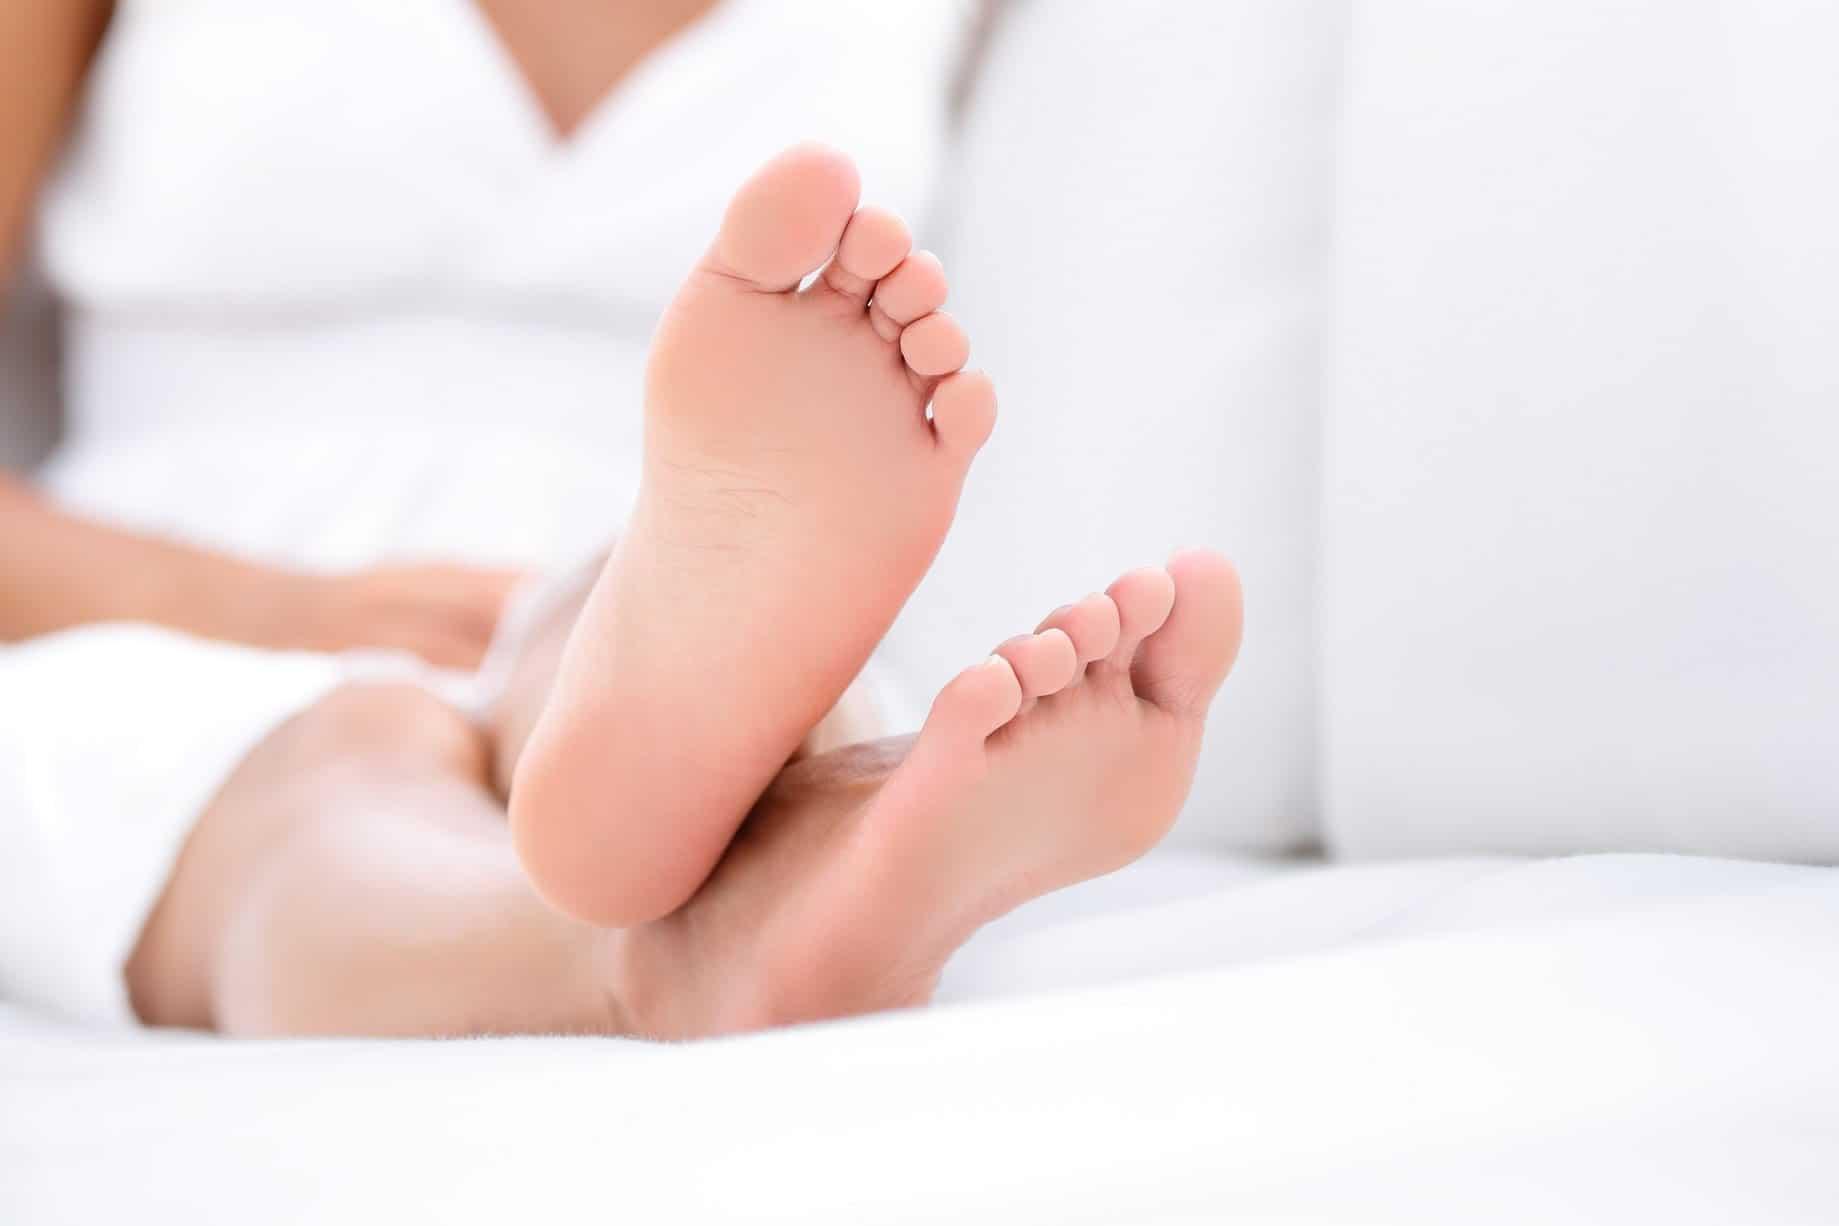 5 Tips to Prevent Sweaty Feet in High Heels